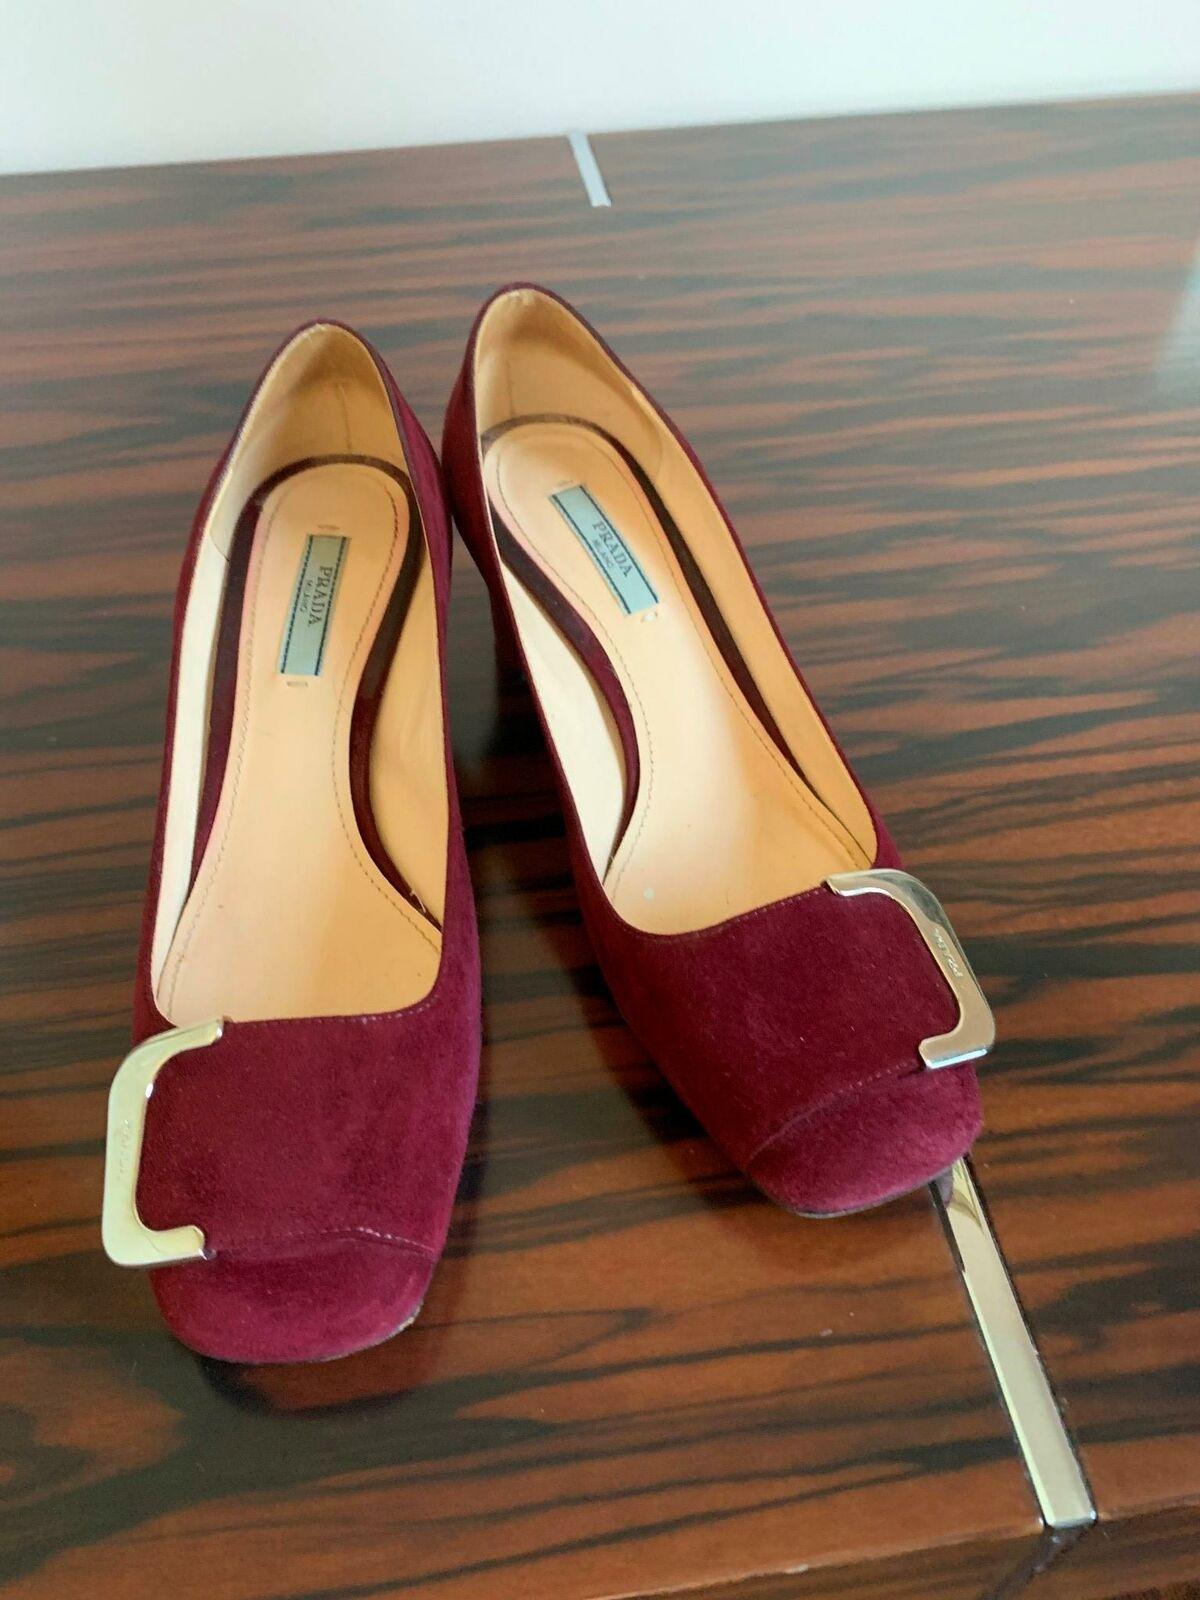 EUC PRADA Suede Wine Purple Pumps 2'' Heel Made in Italy image 6